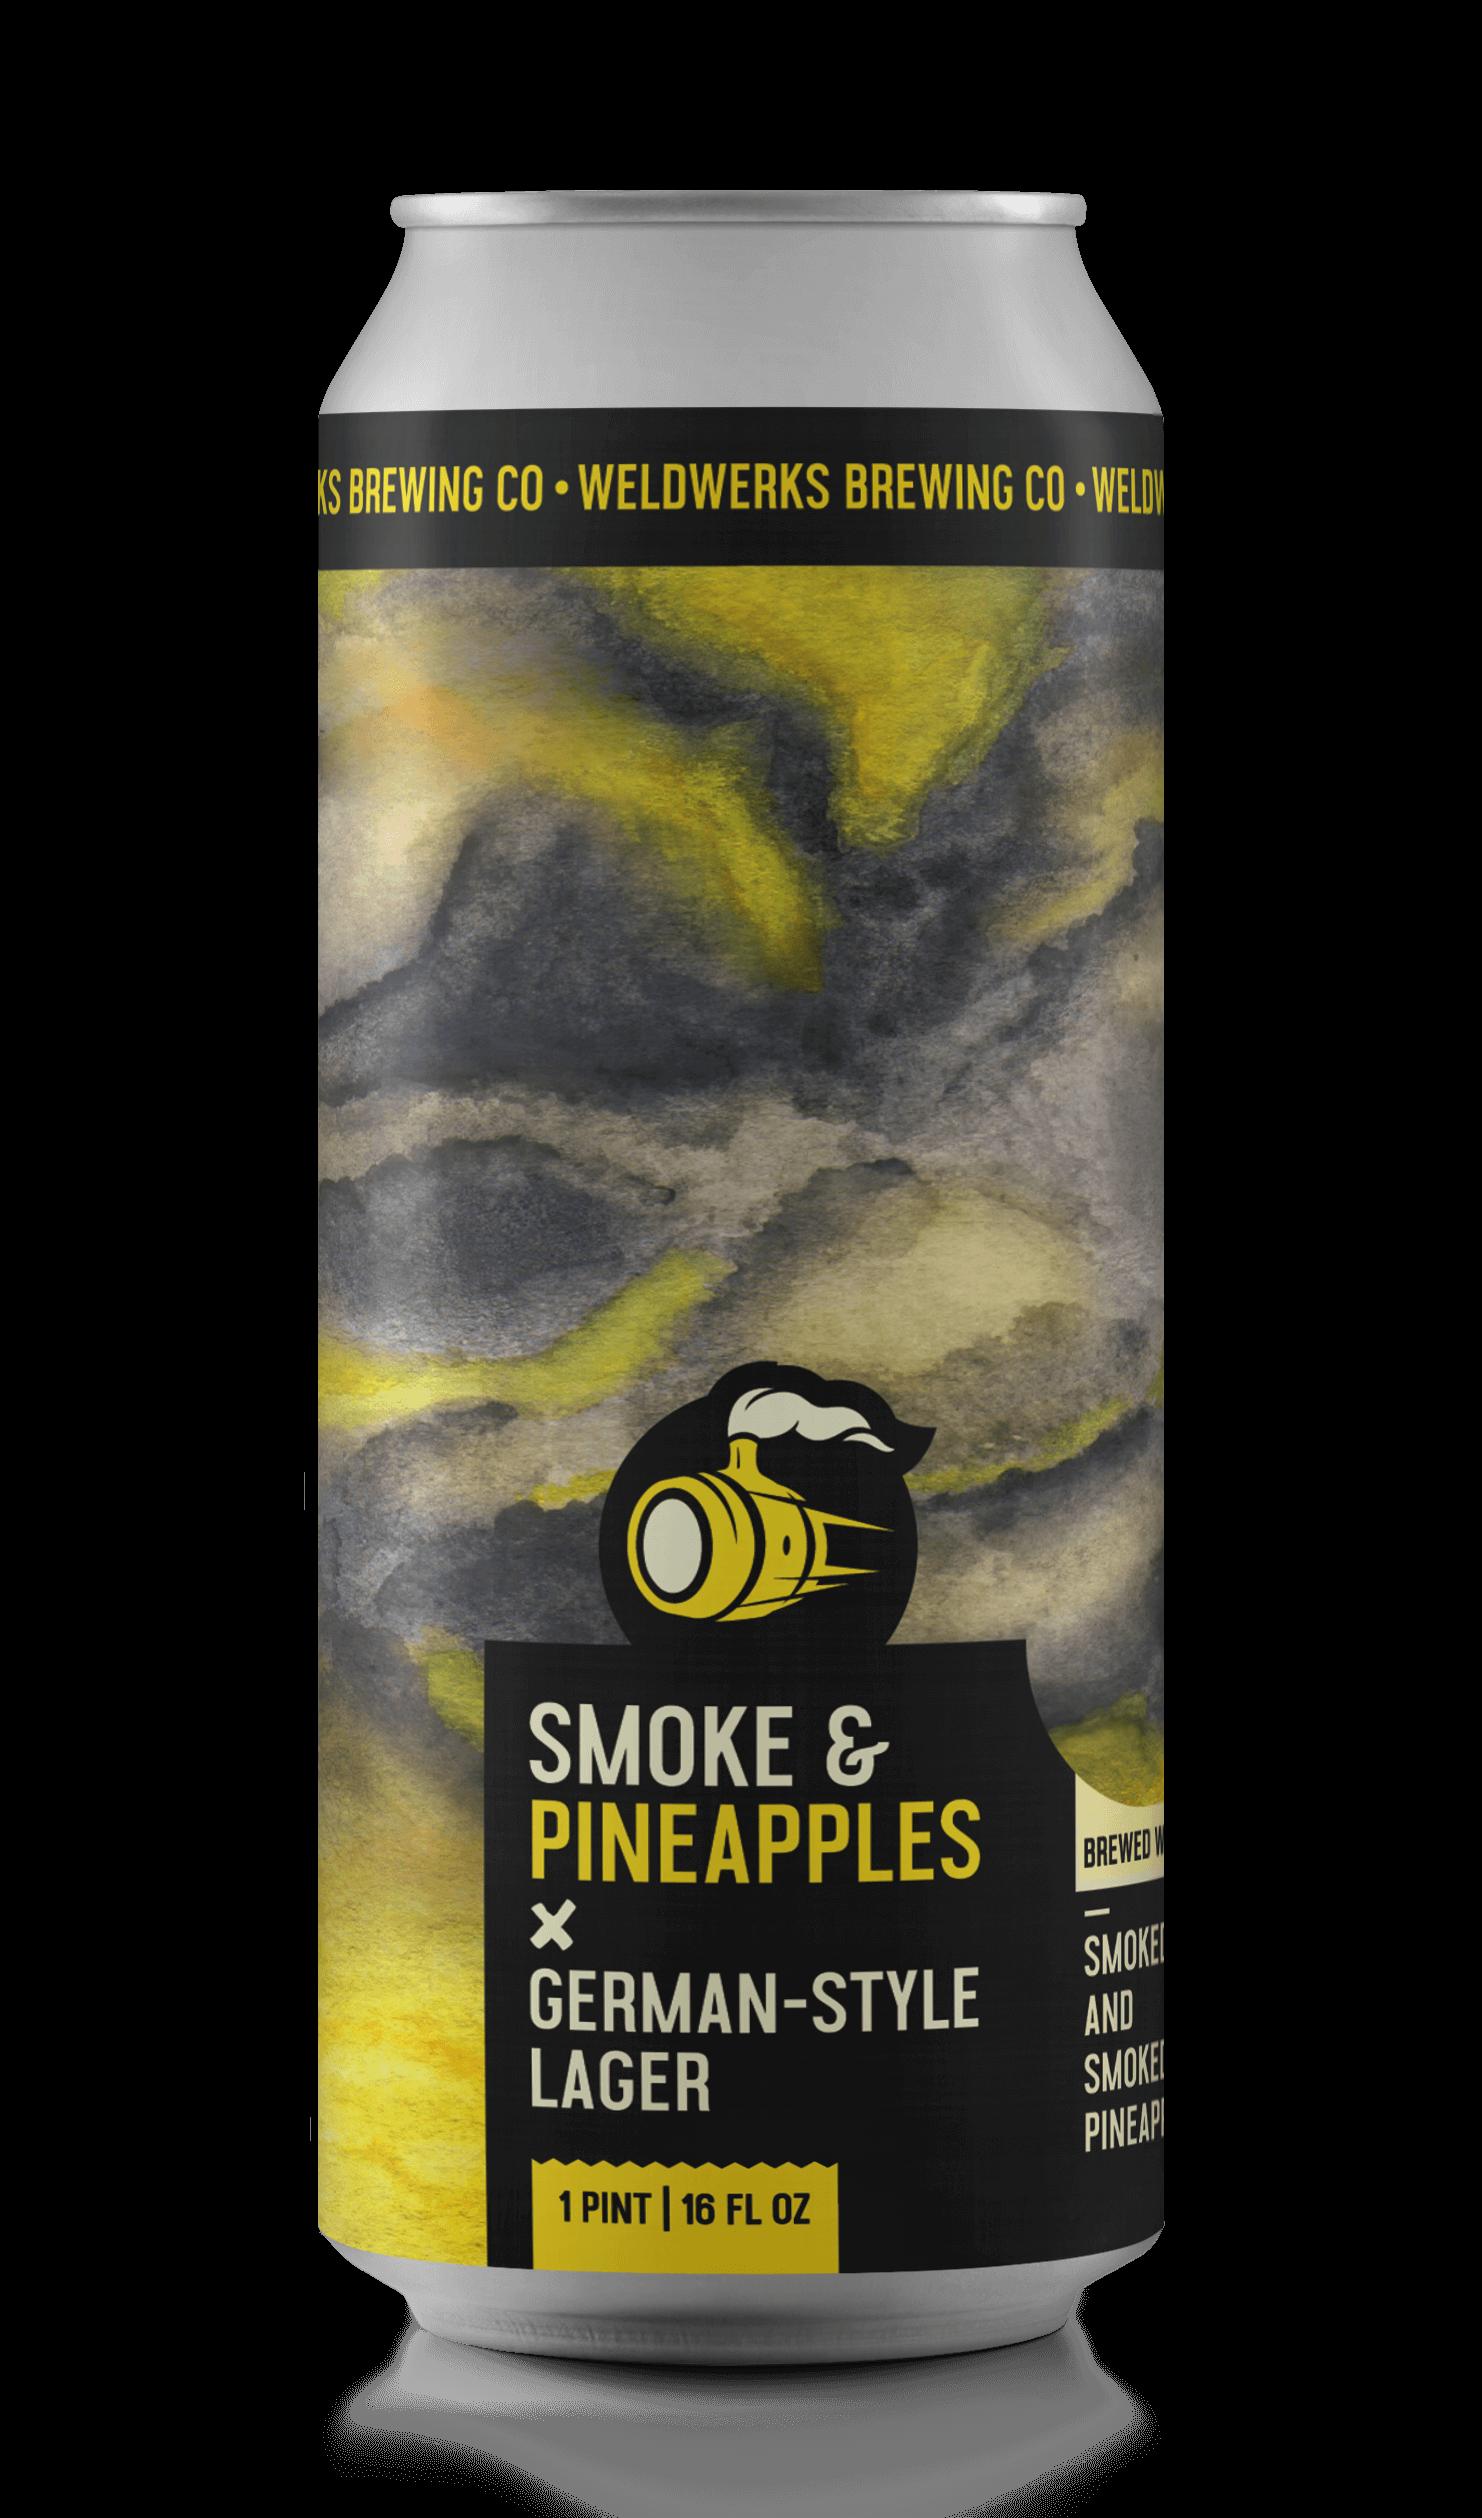 Smoke & Pineapples